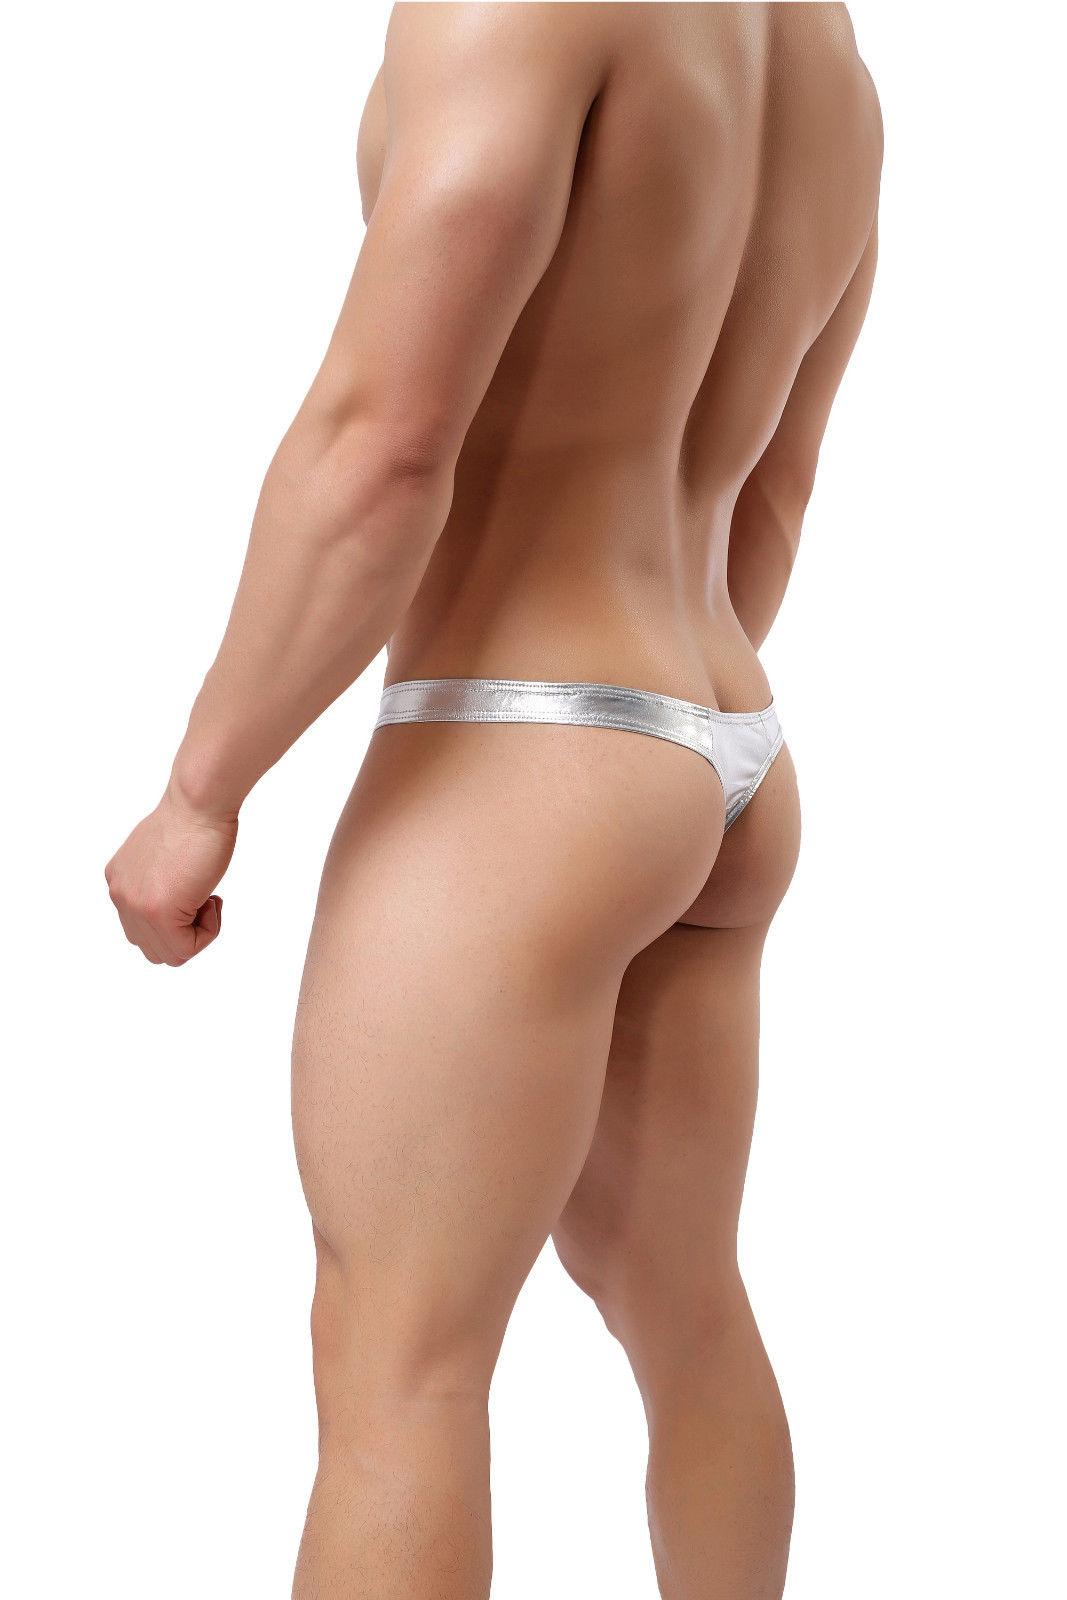 Hard male spank zerotsm